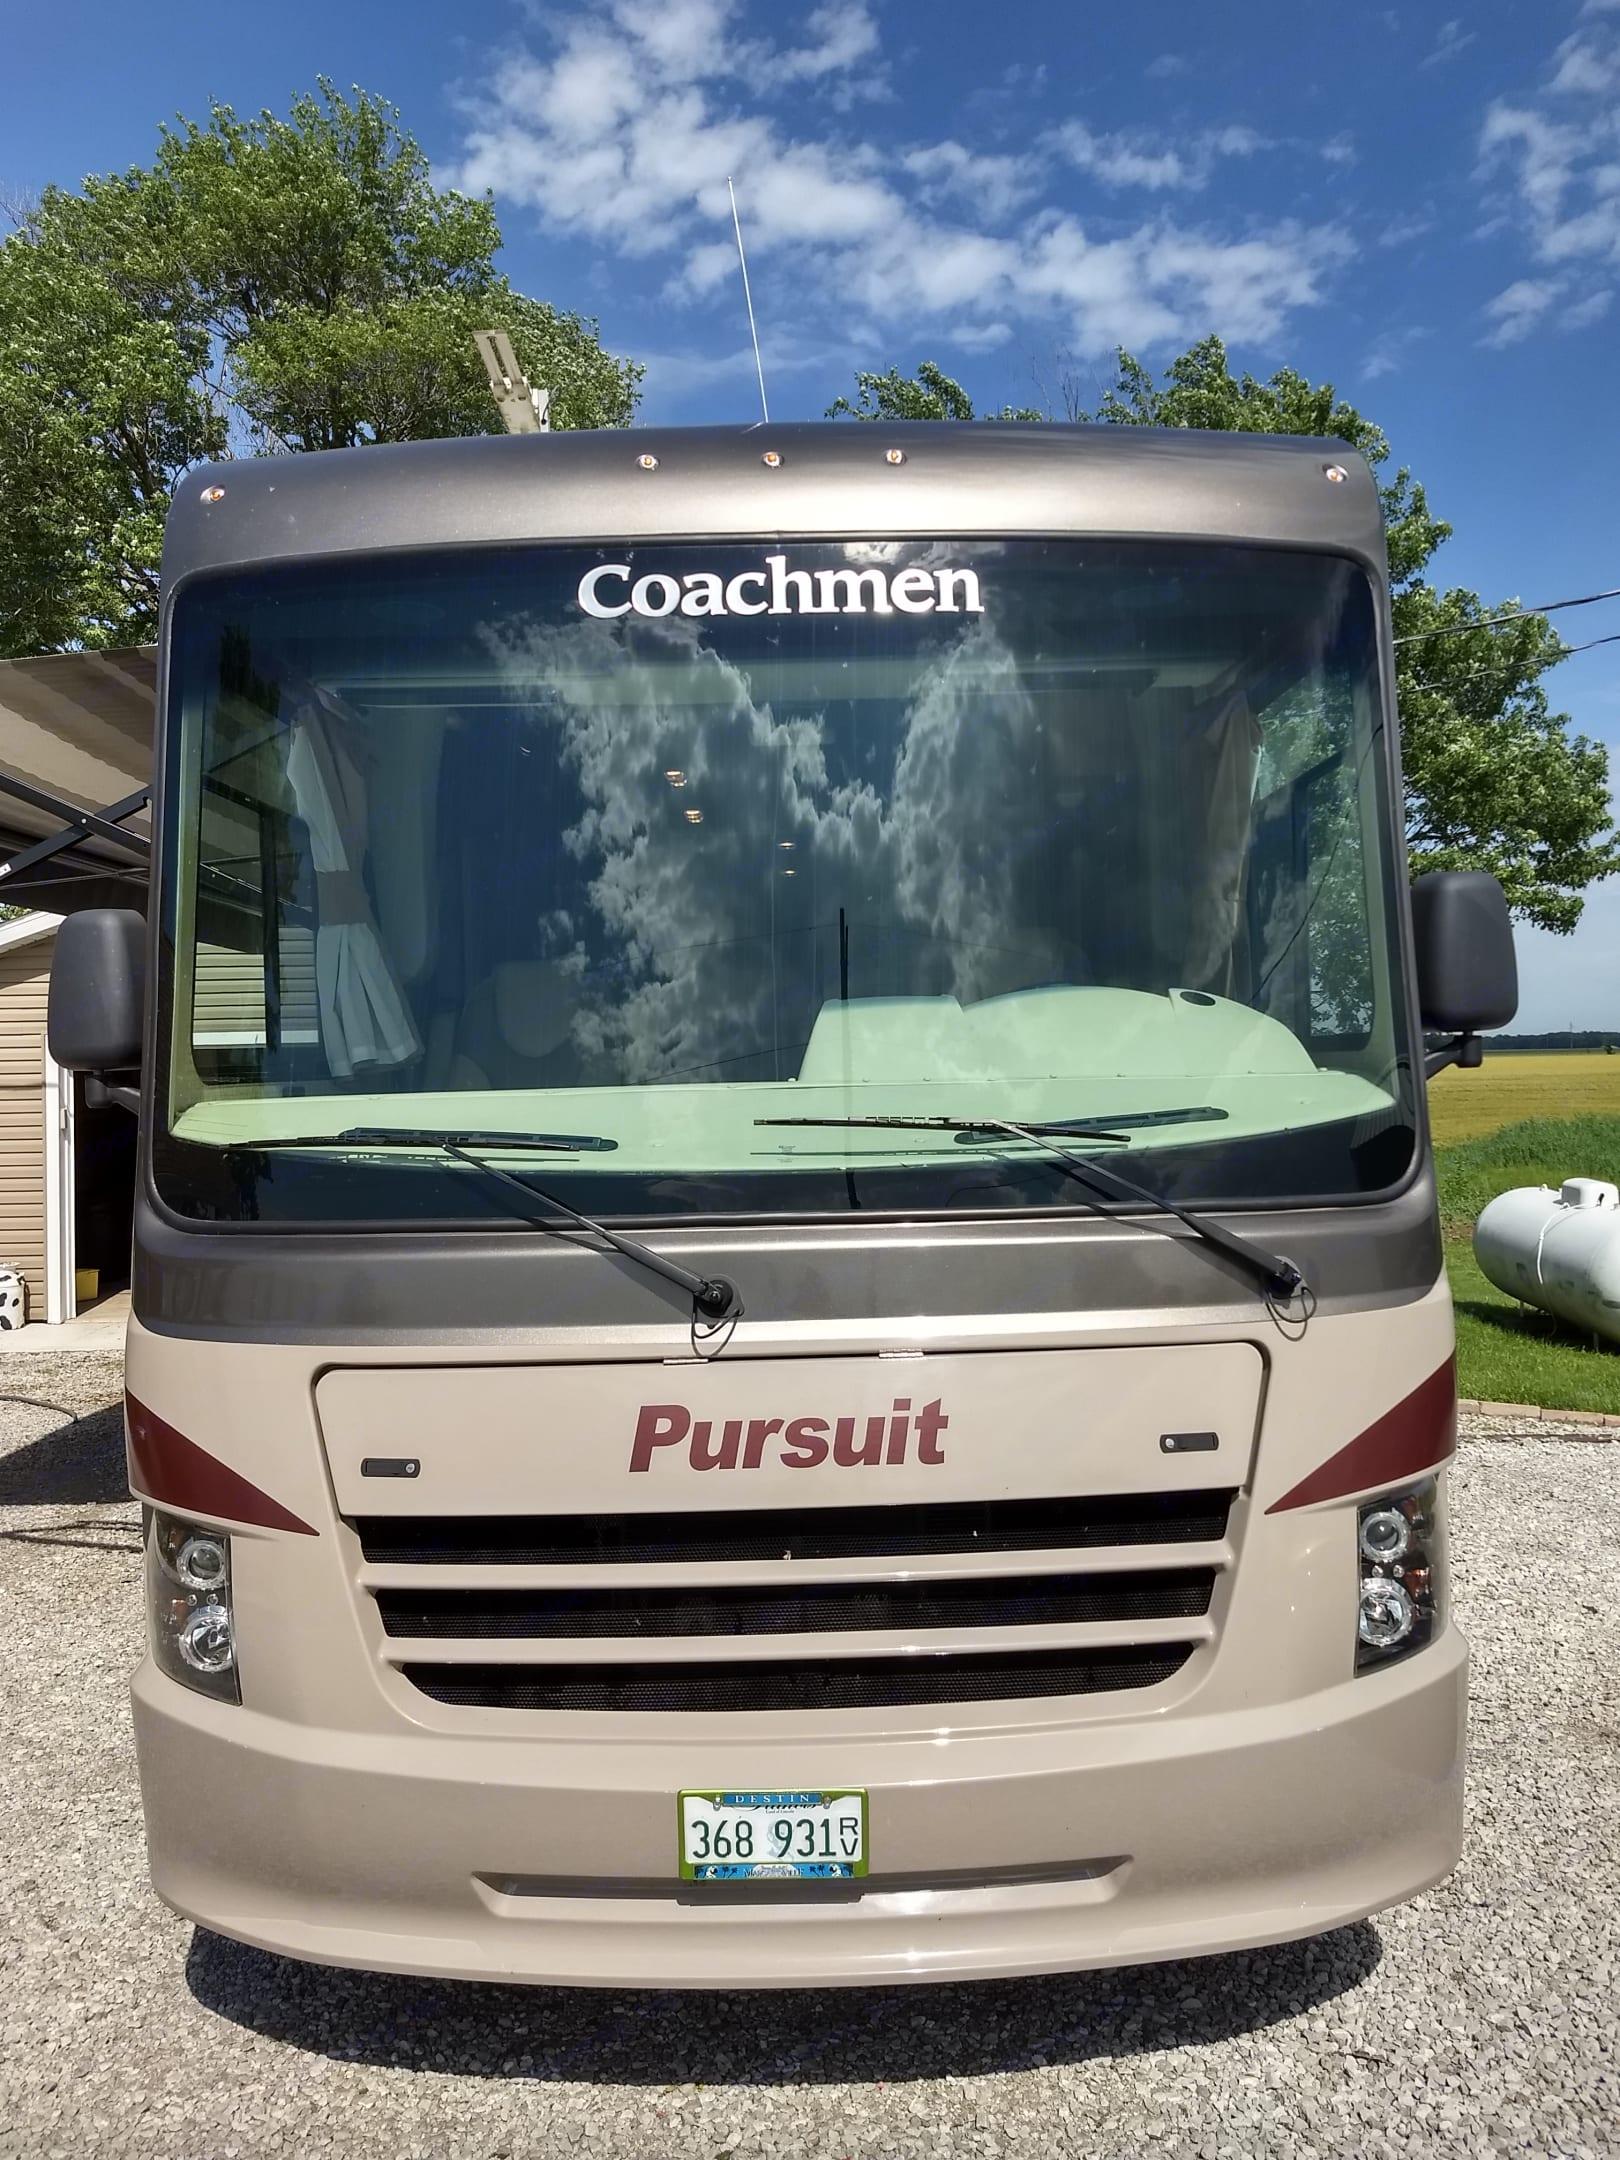 Coachman Pursuit 2015